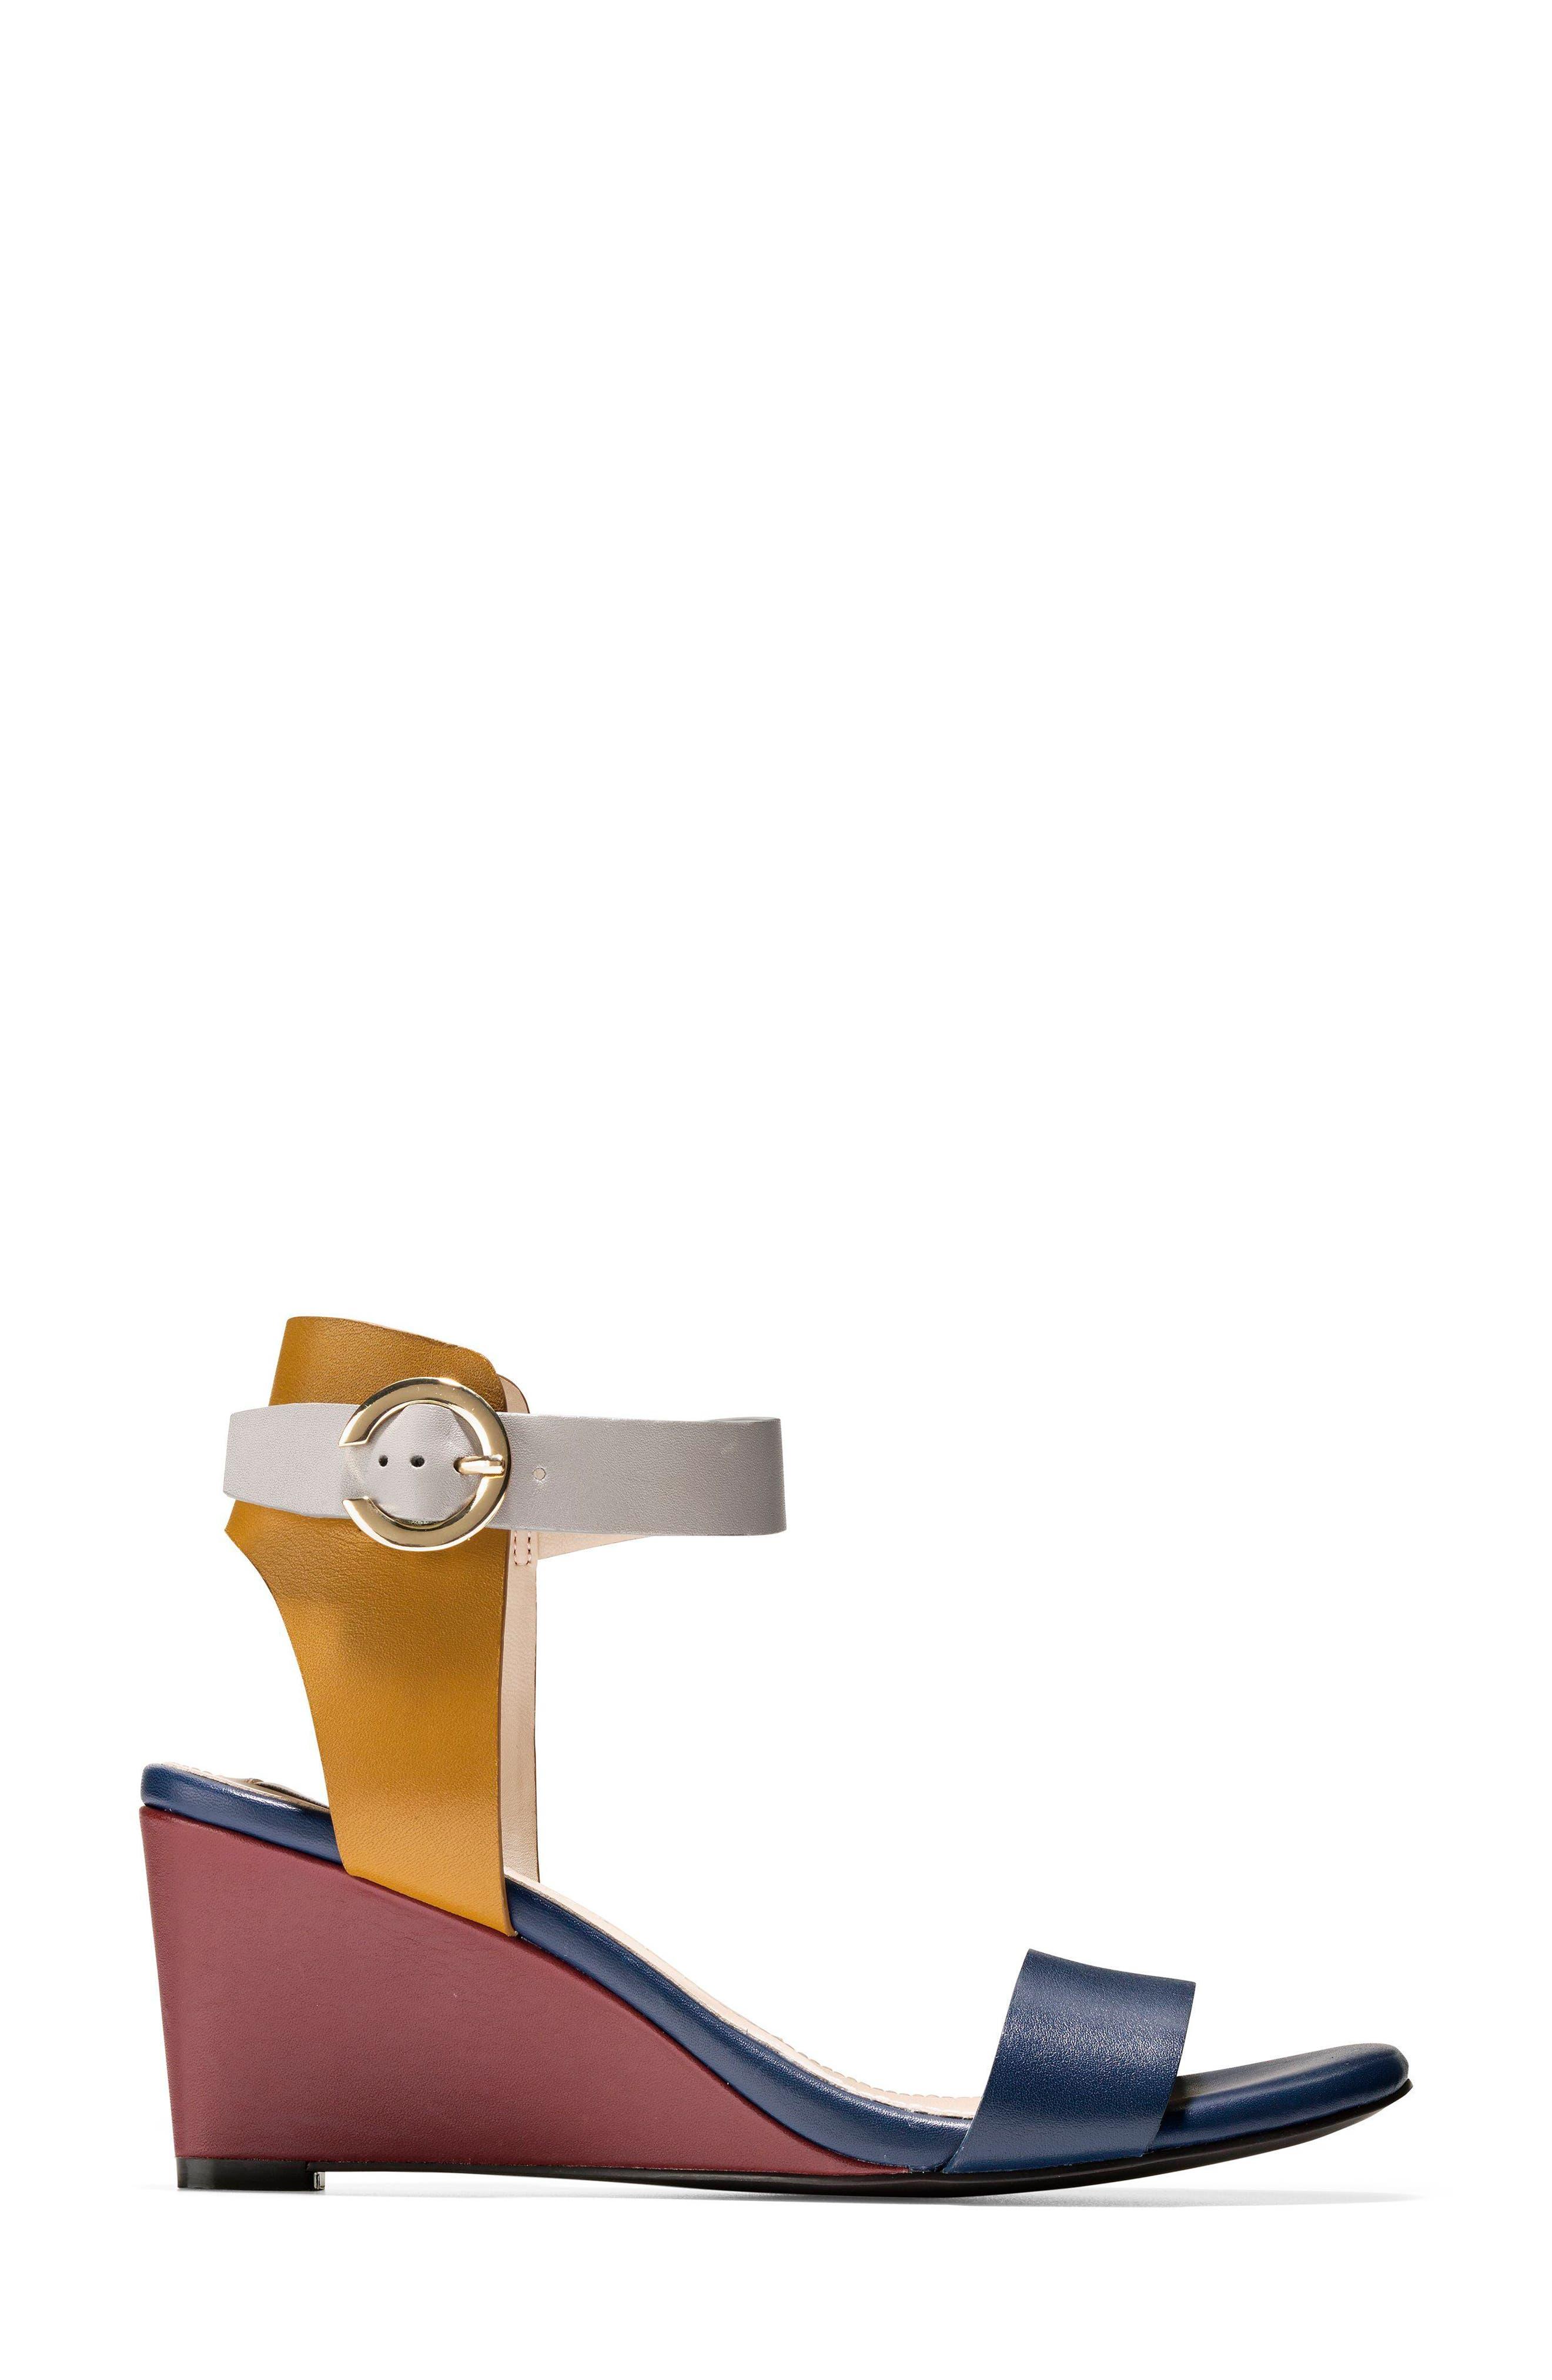 Rosalind Wedge Sandal,                             Alternate thumbnail 9, color,